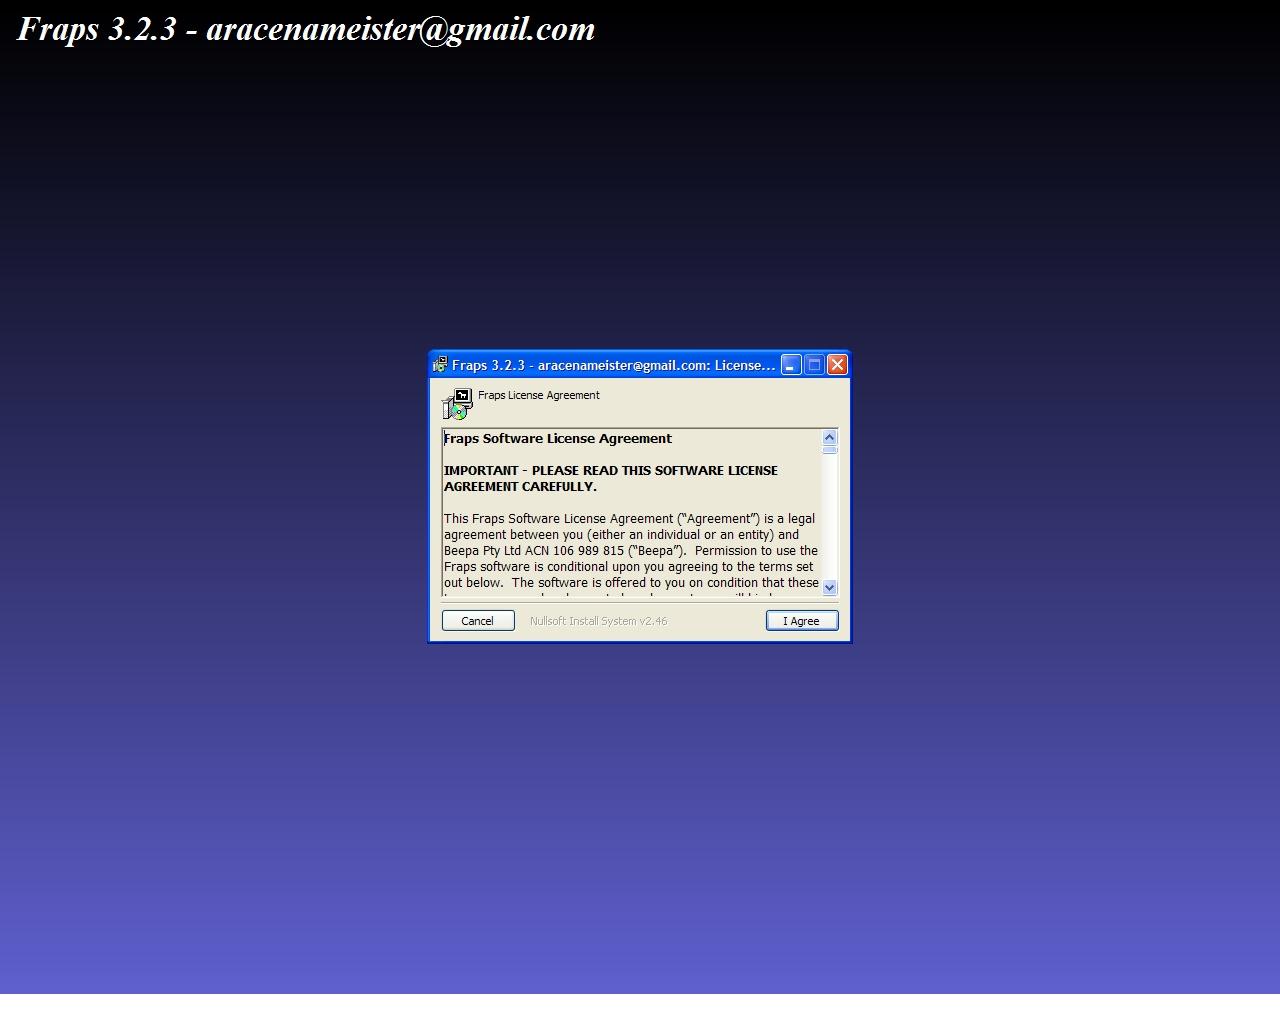 fraps full version free download windows 8